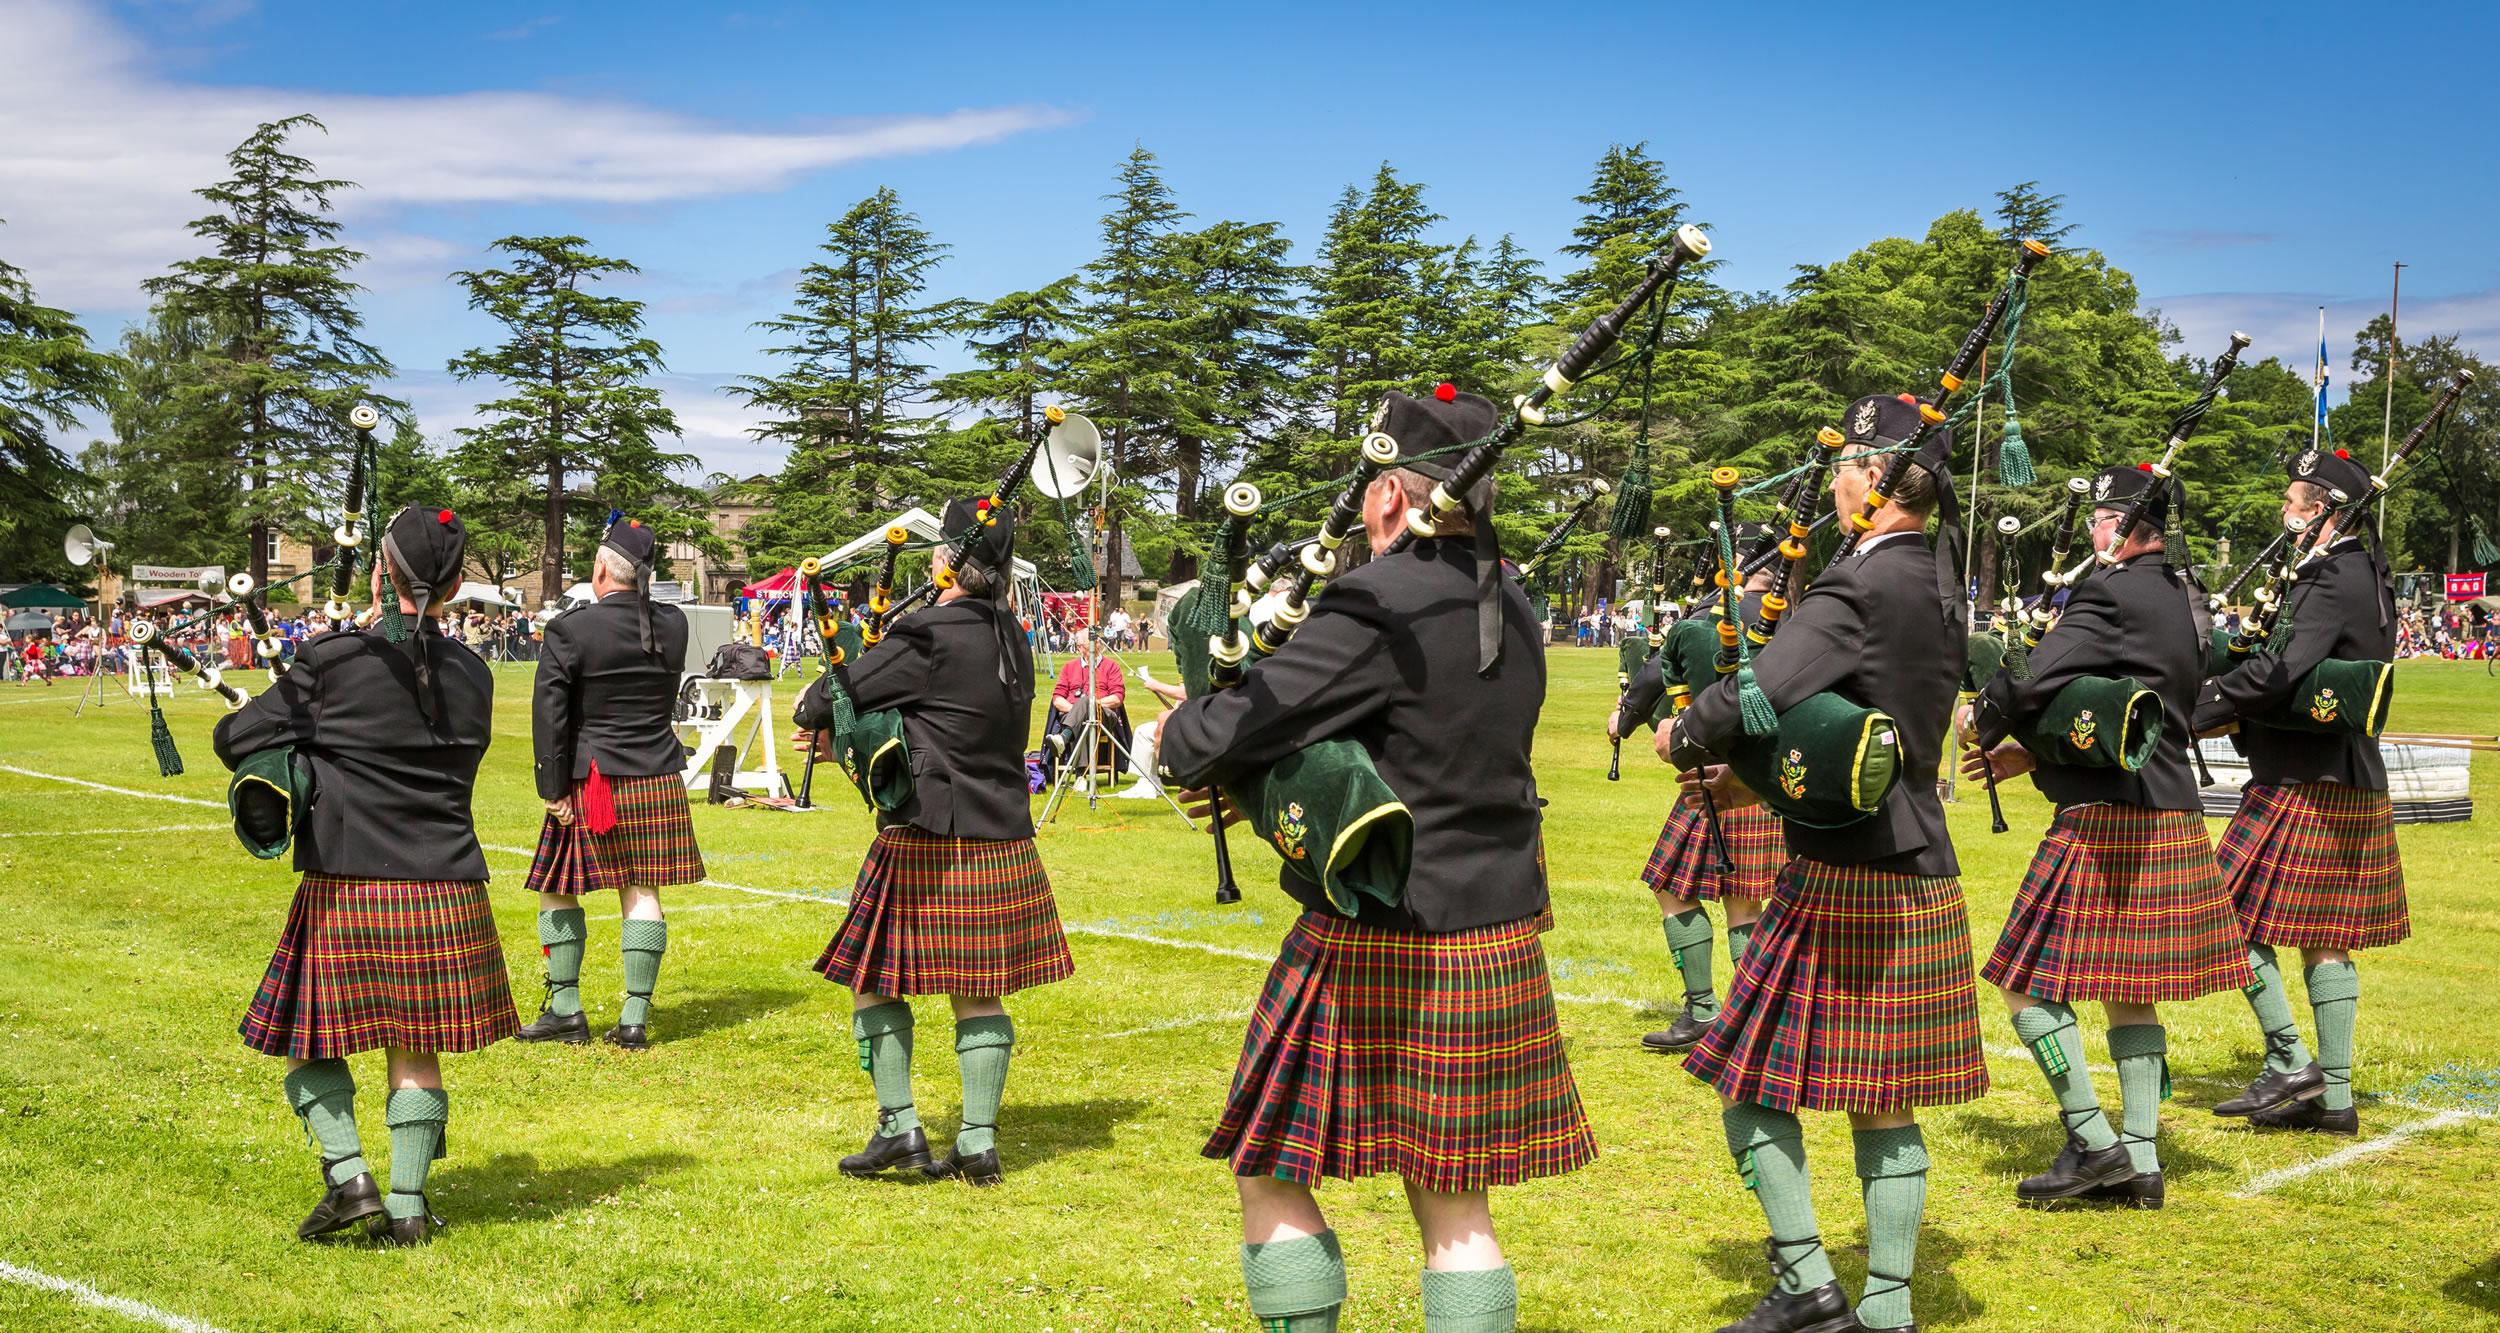 Loch Lomond Highland Games (July 2020)